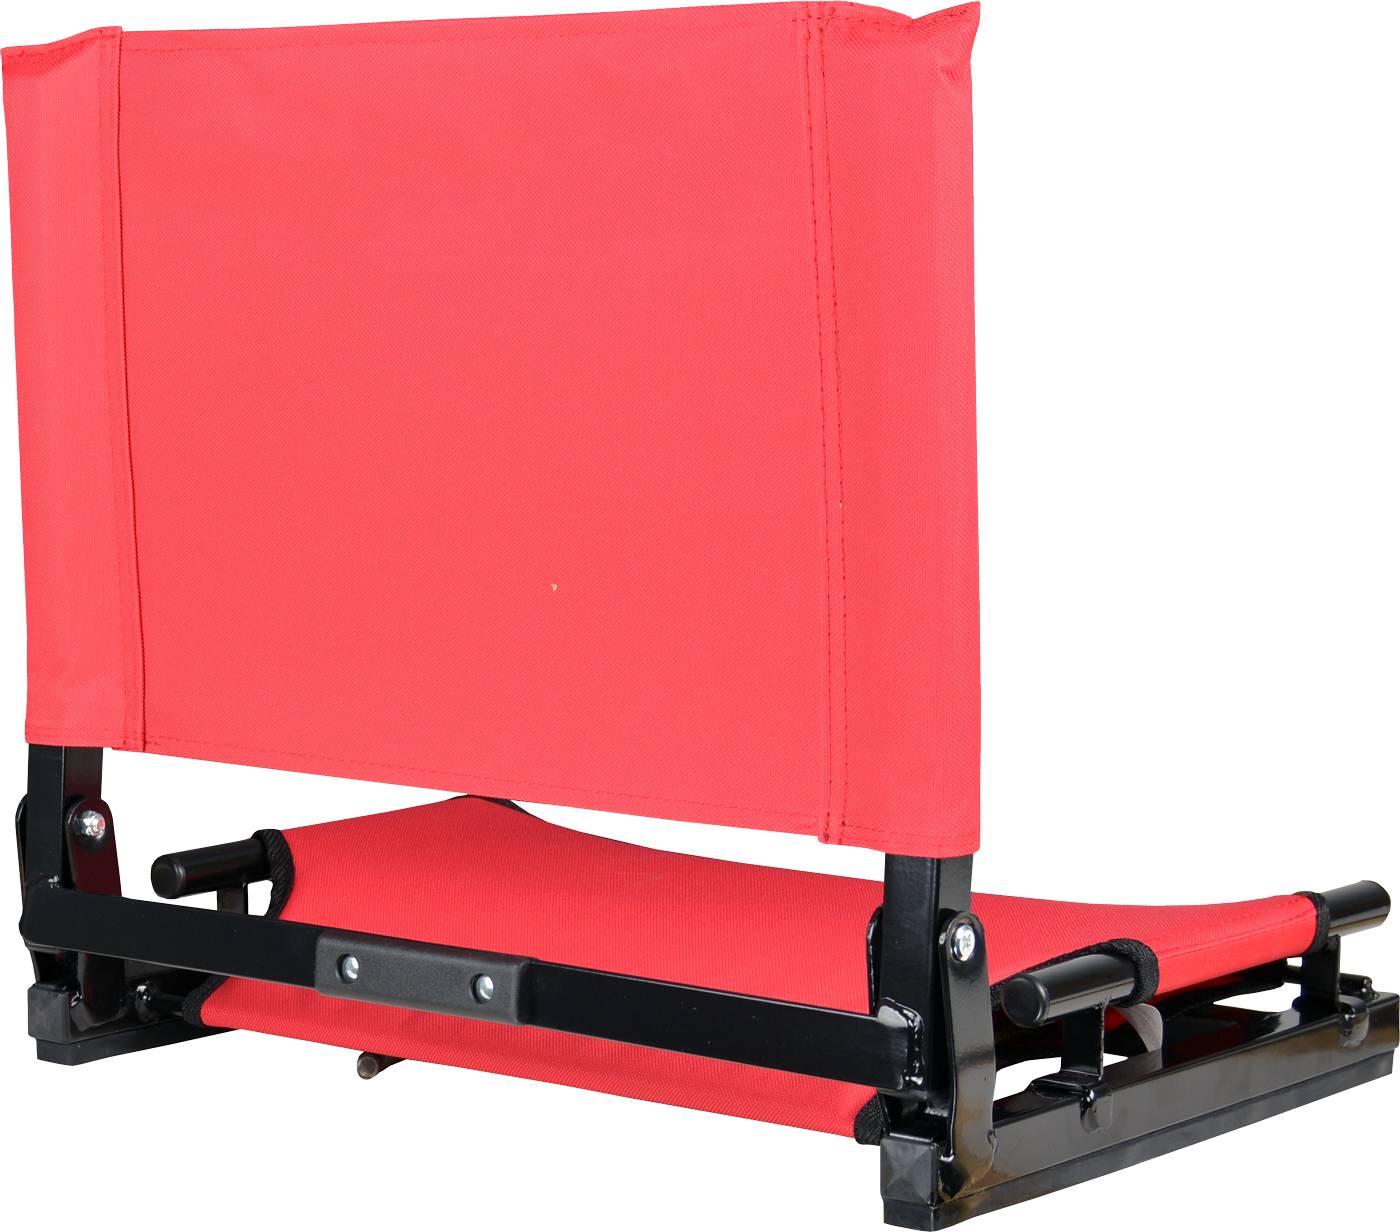 Stadium Chair Stadium Bleacher Chairs SportsUnlimited – Chair for Bleachers